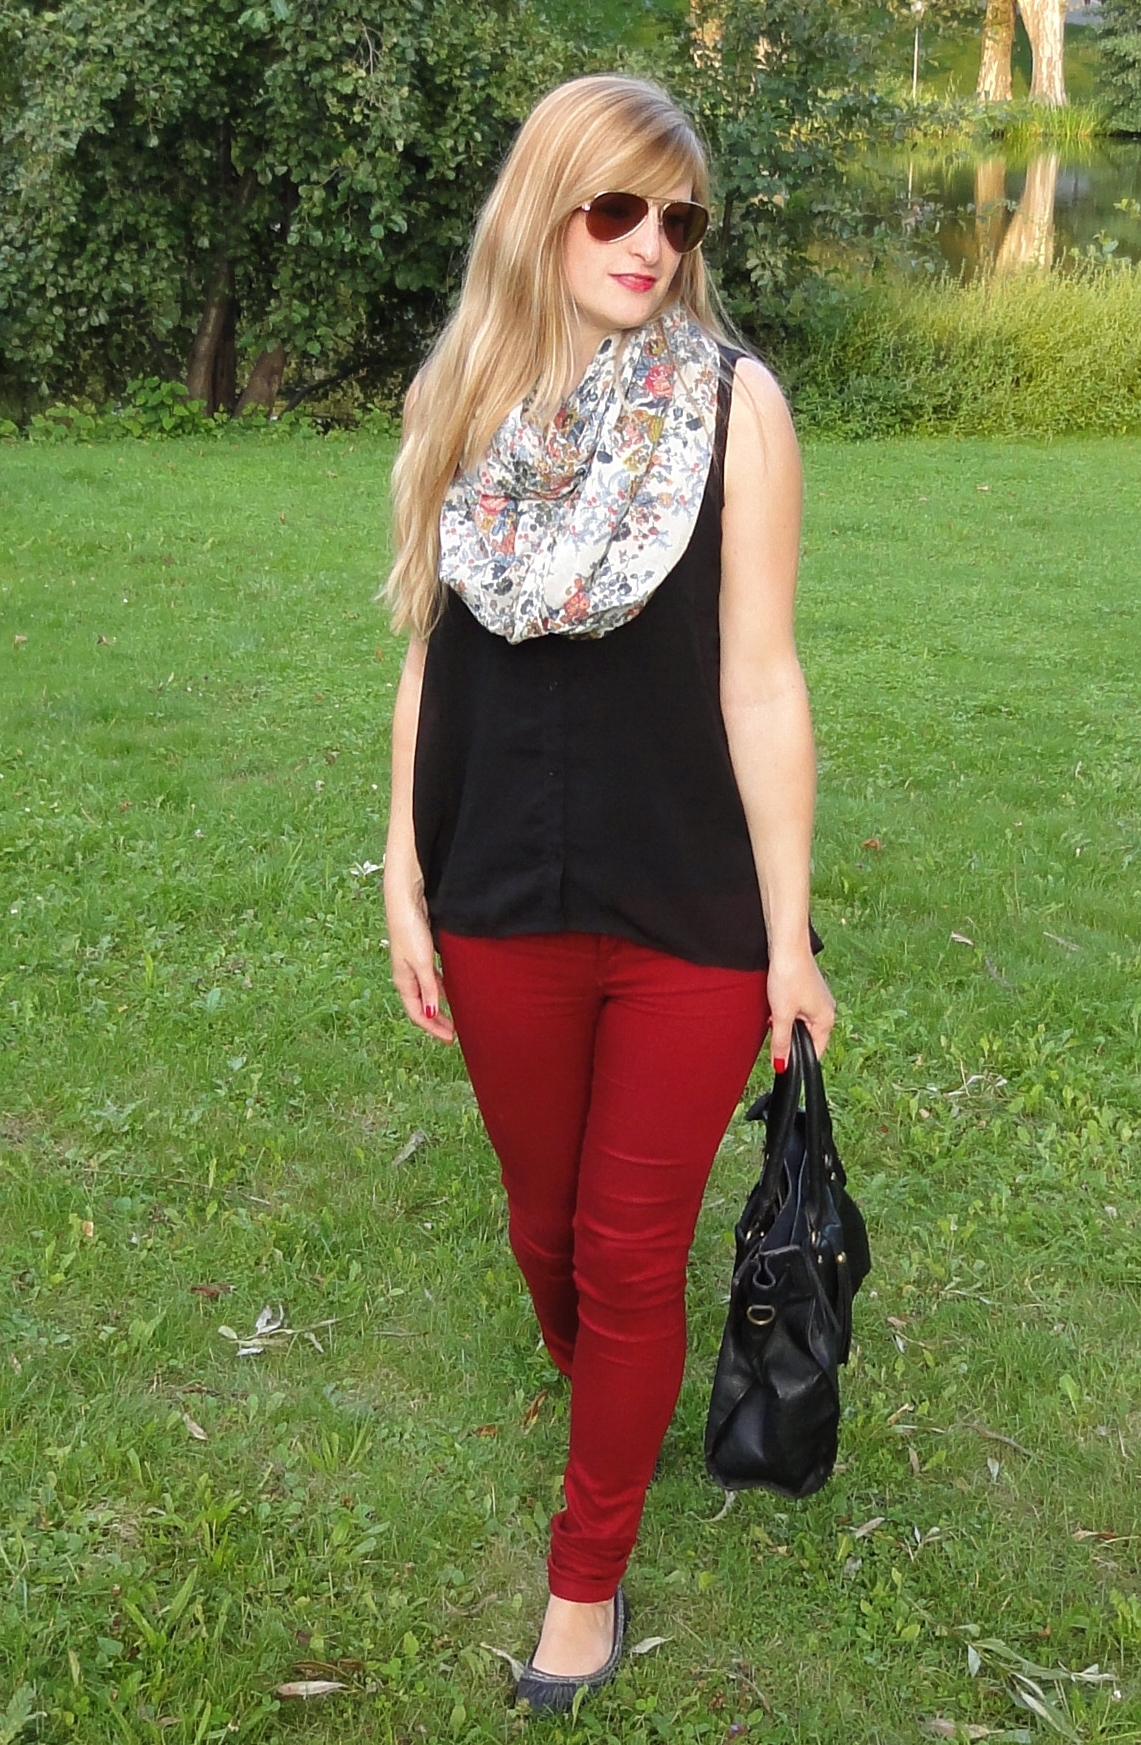 Rote Sommerhose in Stuttgart